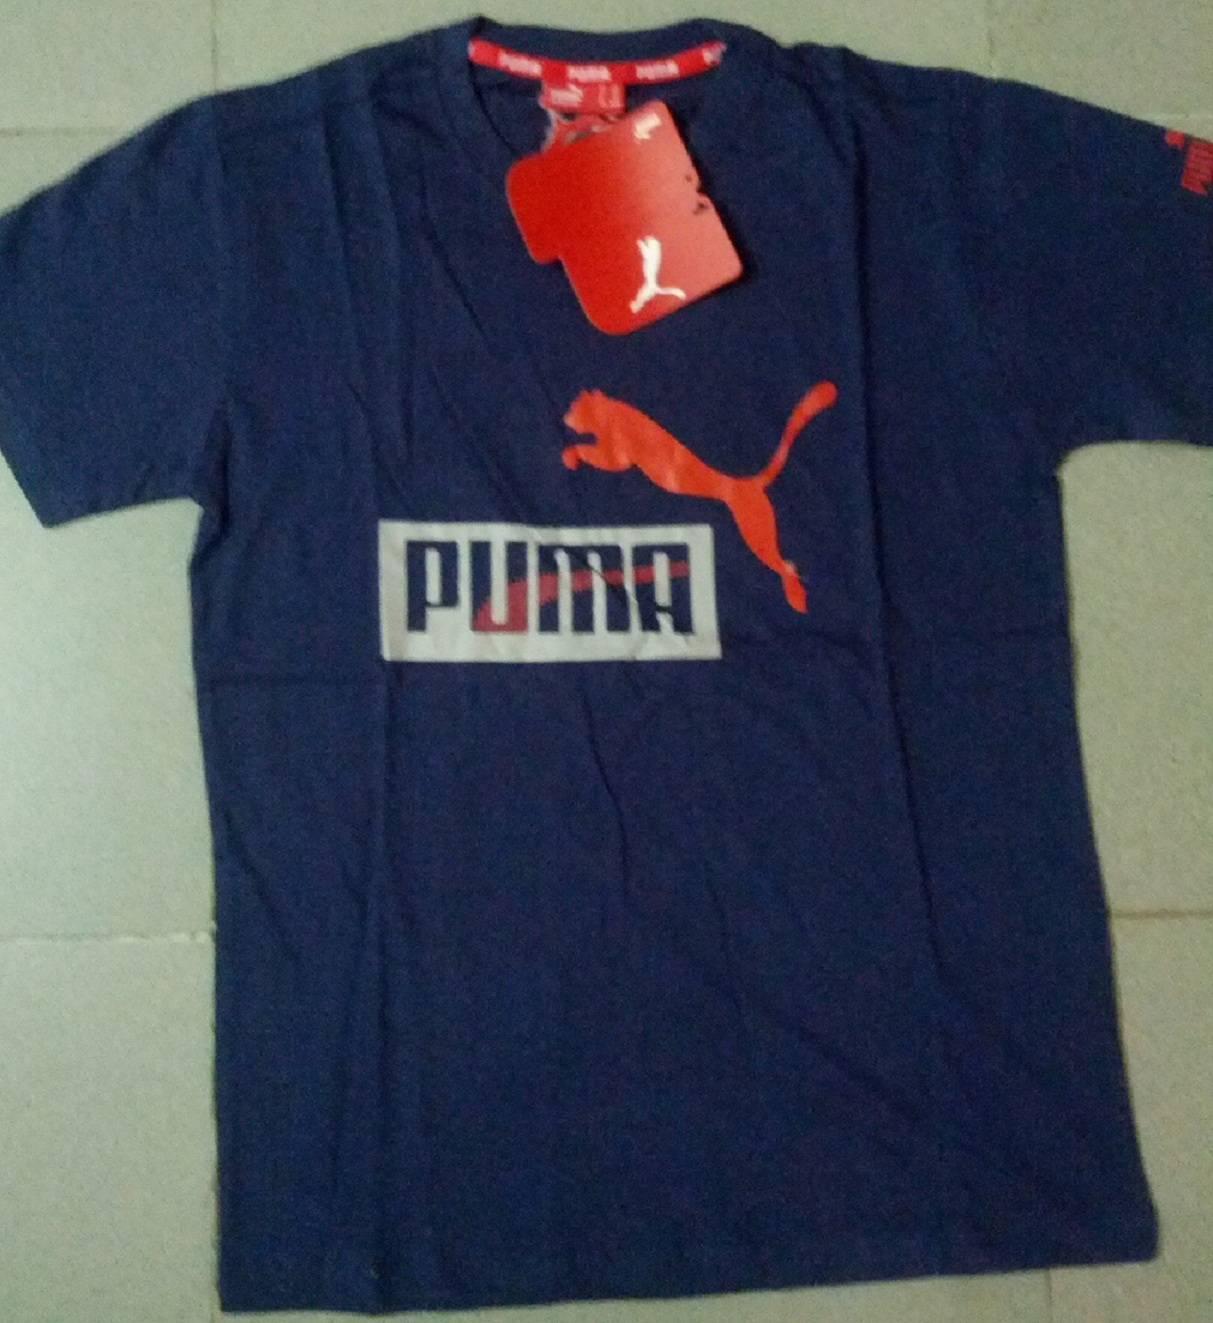 Men's 100% preminum cotton printed T-shirt